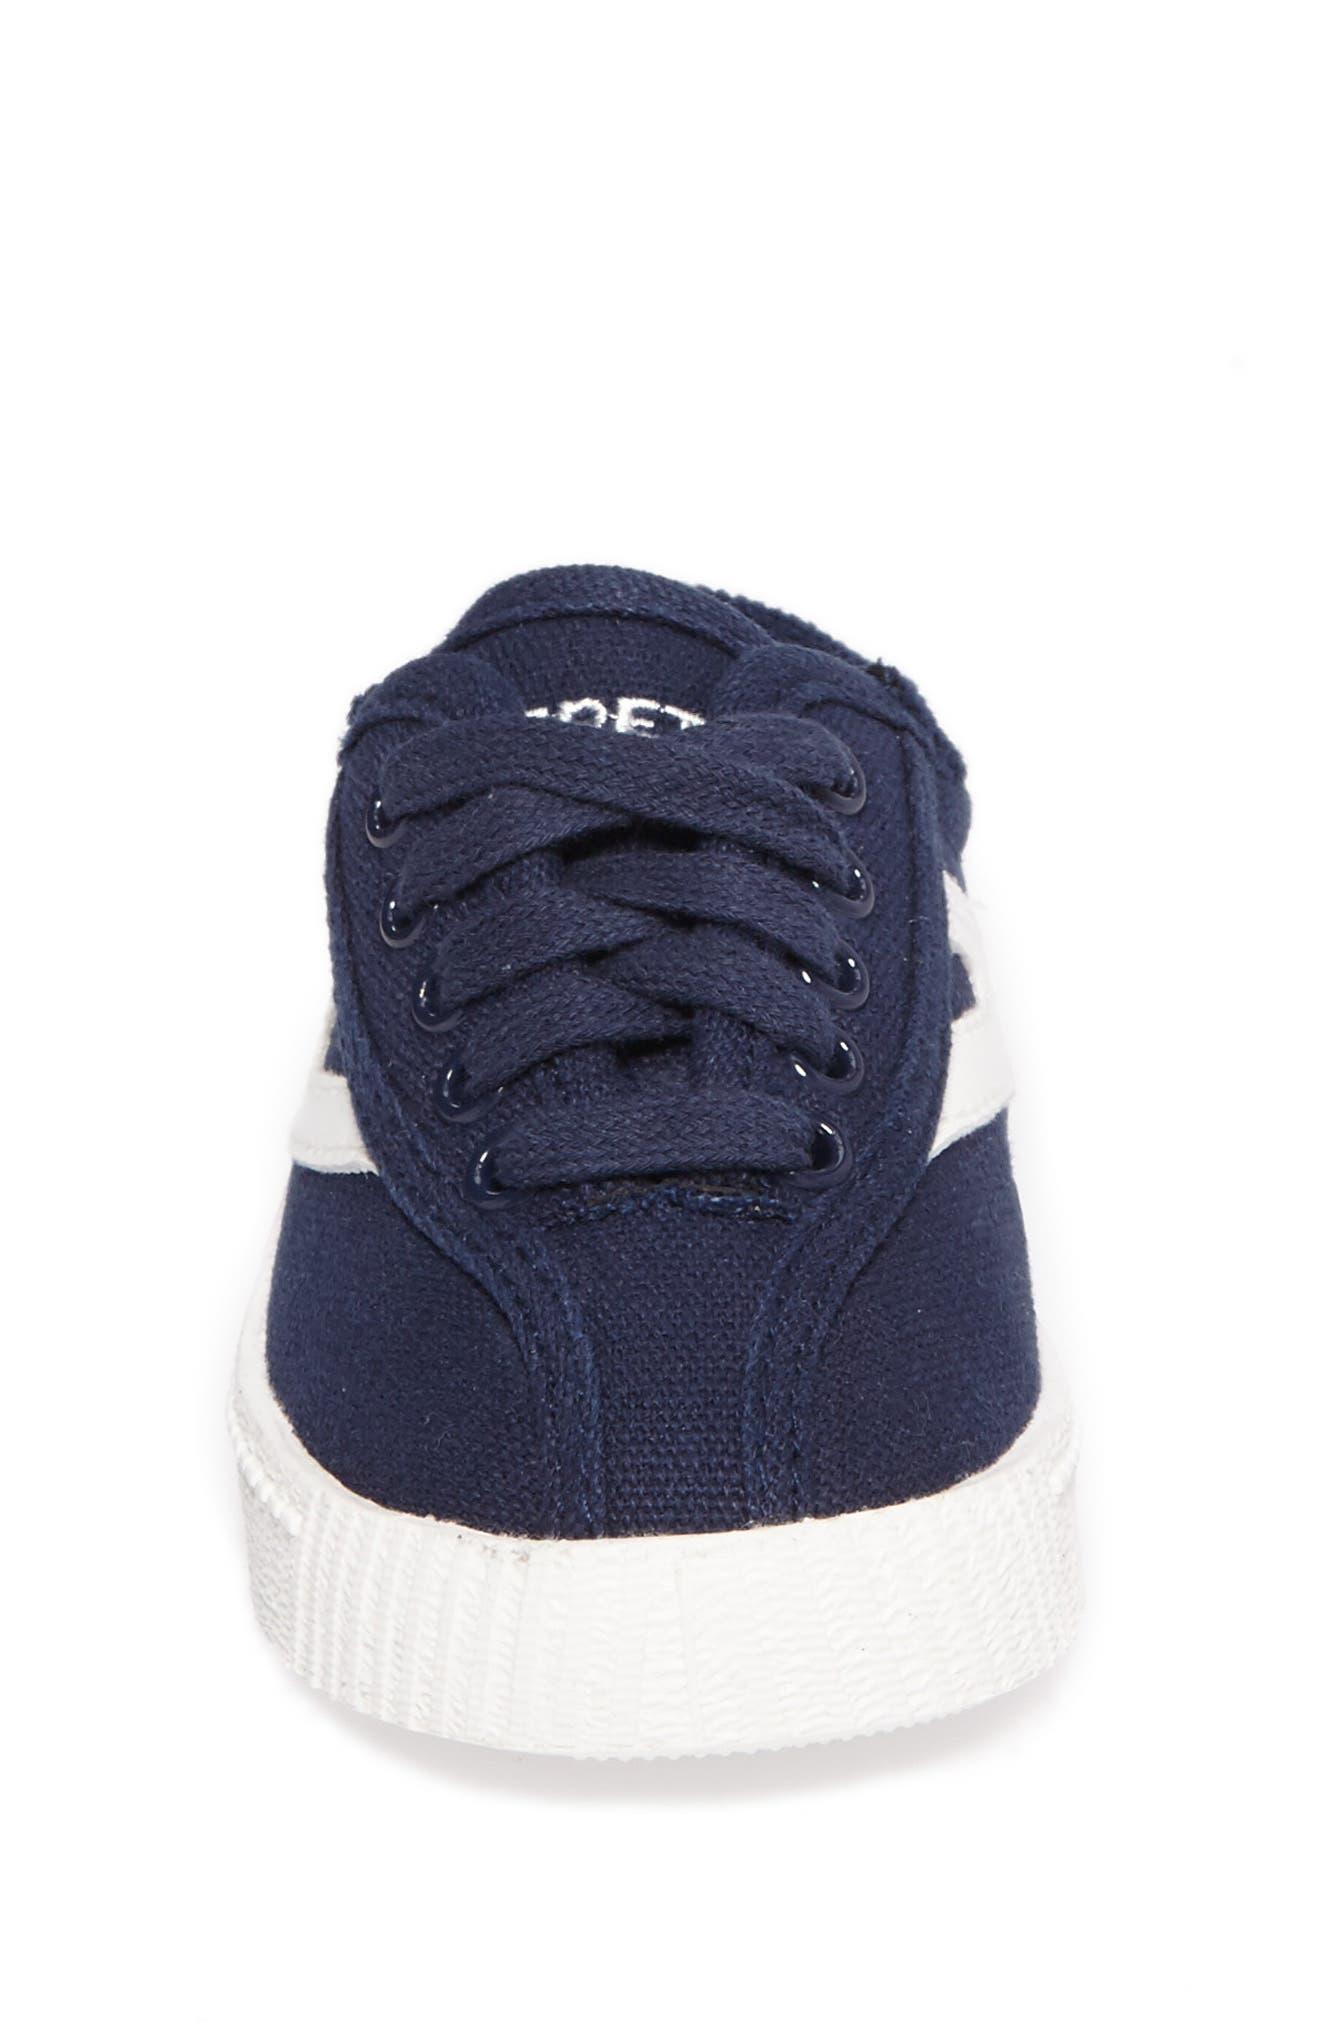 Nylite Plus Sneaker,                             Alternate thumbnail 12, color,